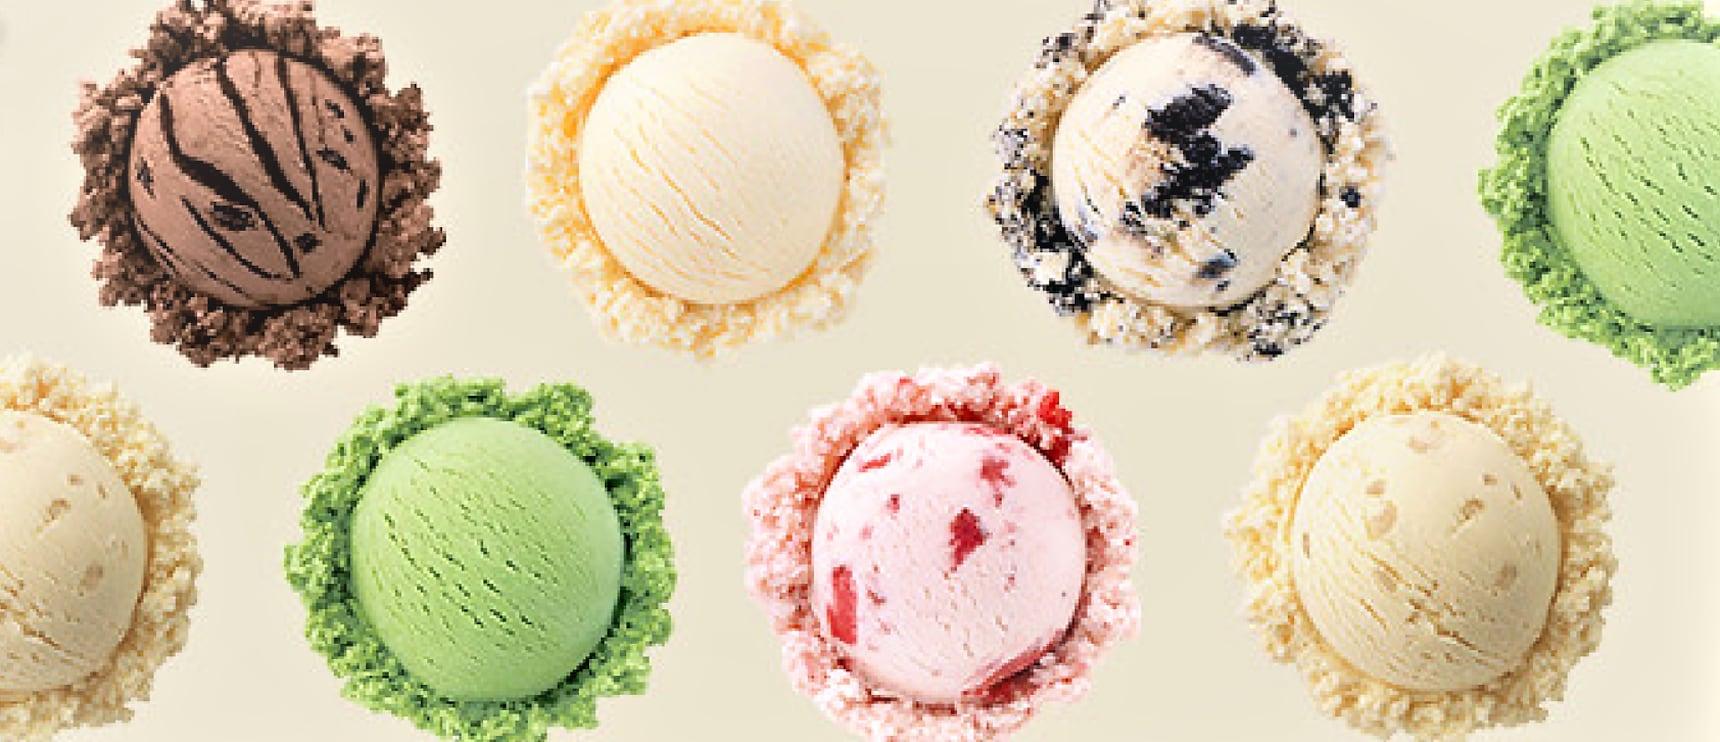 6 Häagen-Dazs Flavors Exclusive to Japan